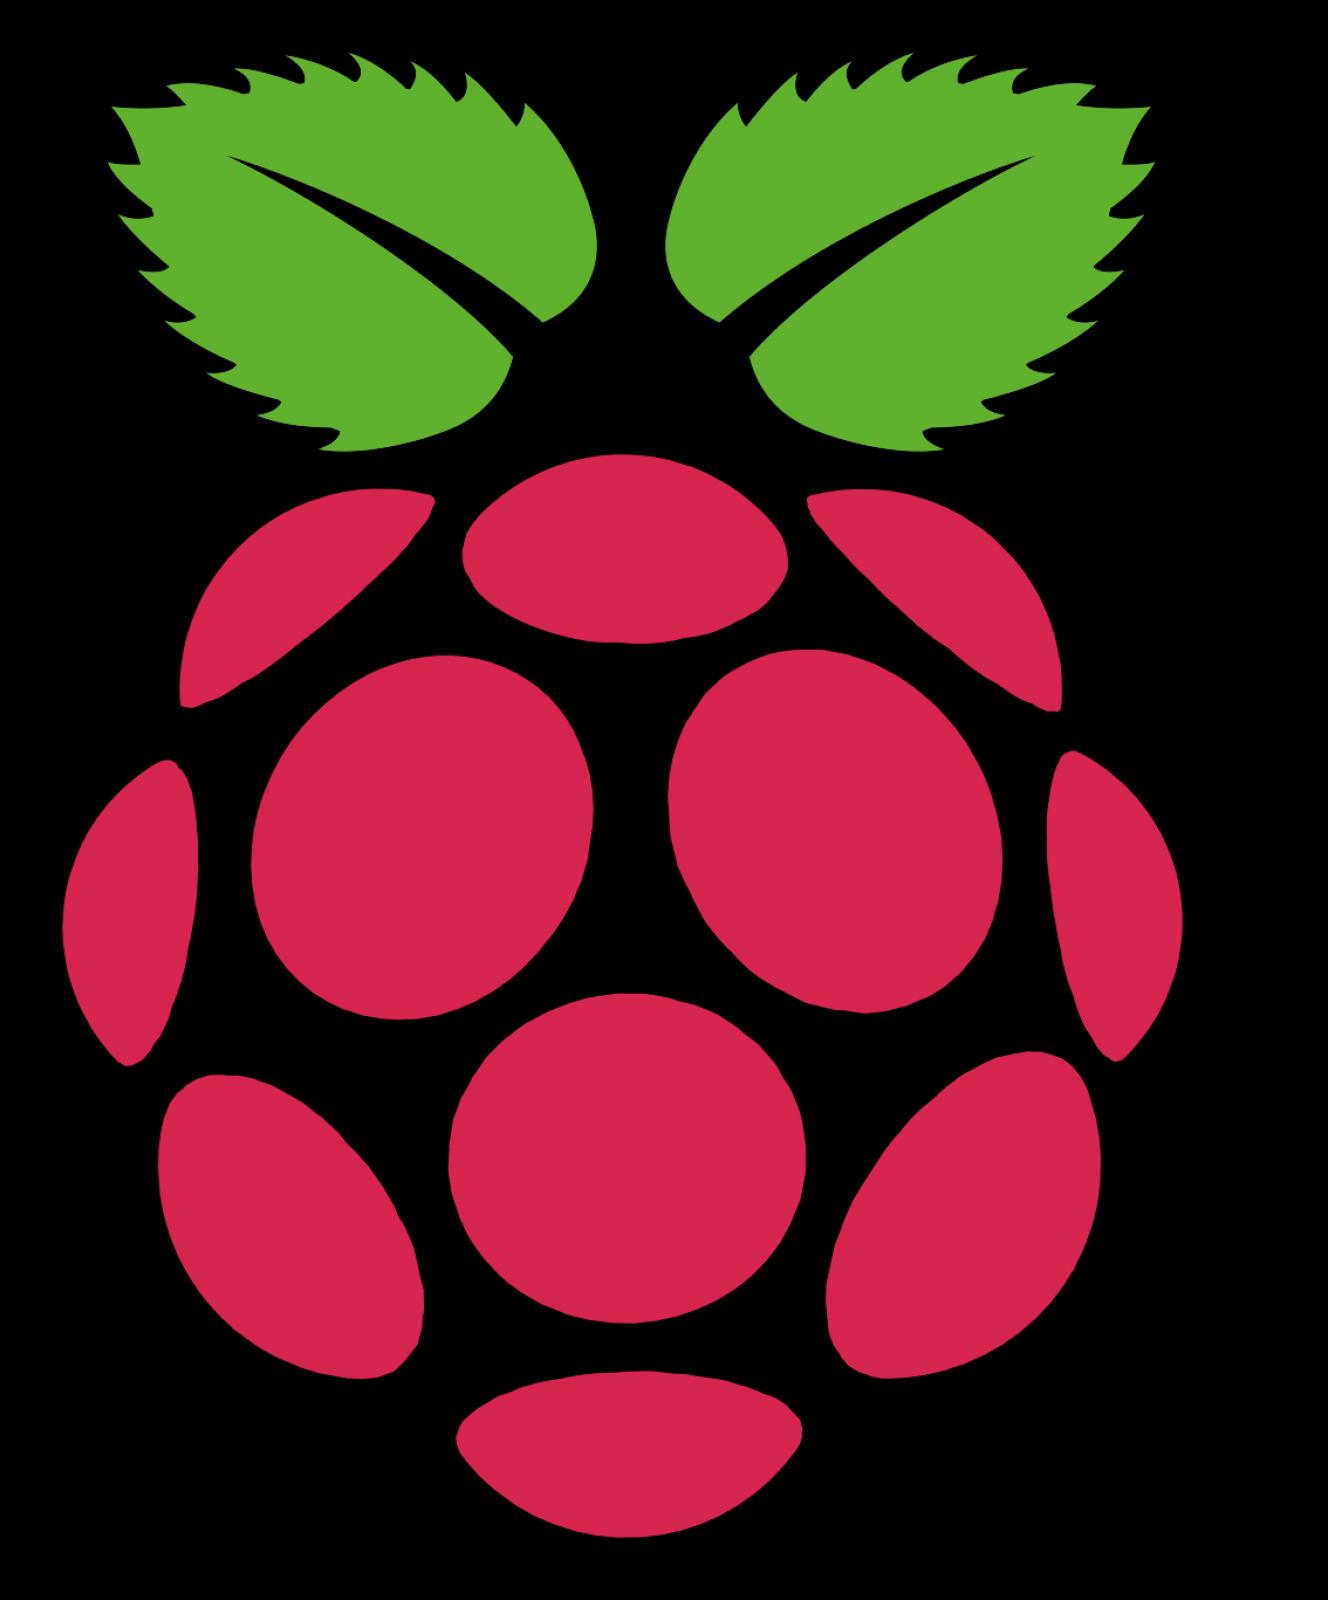 How to find your Raspberry Pi's IP address   Raspberry Pi